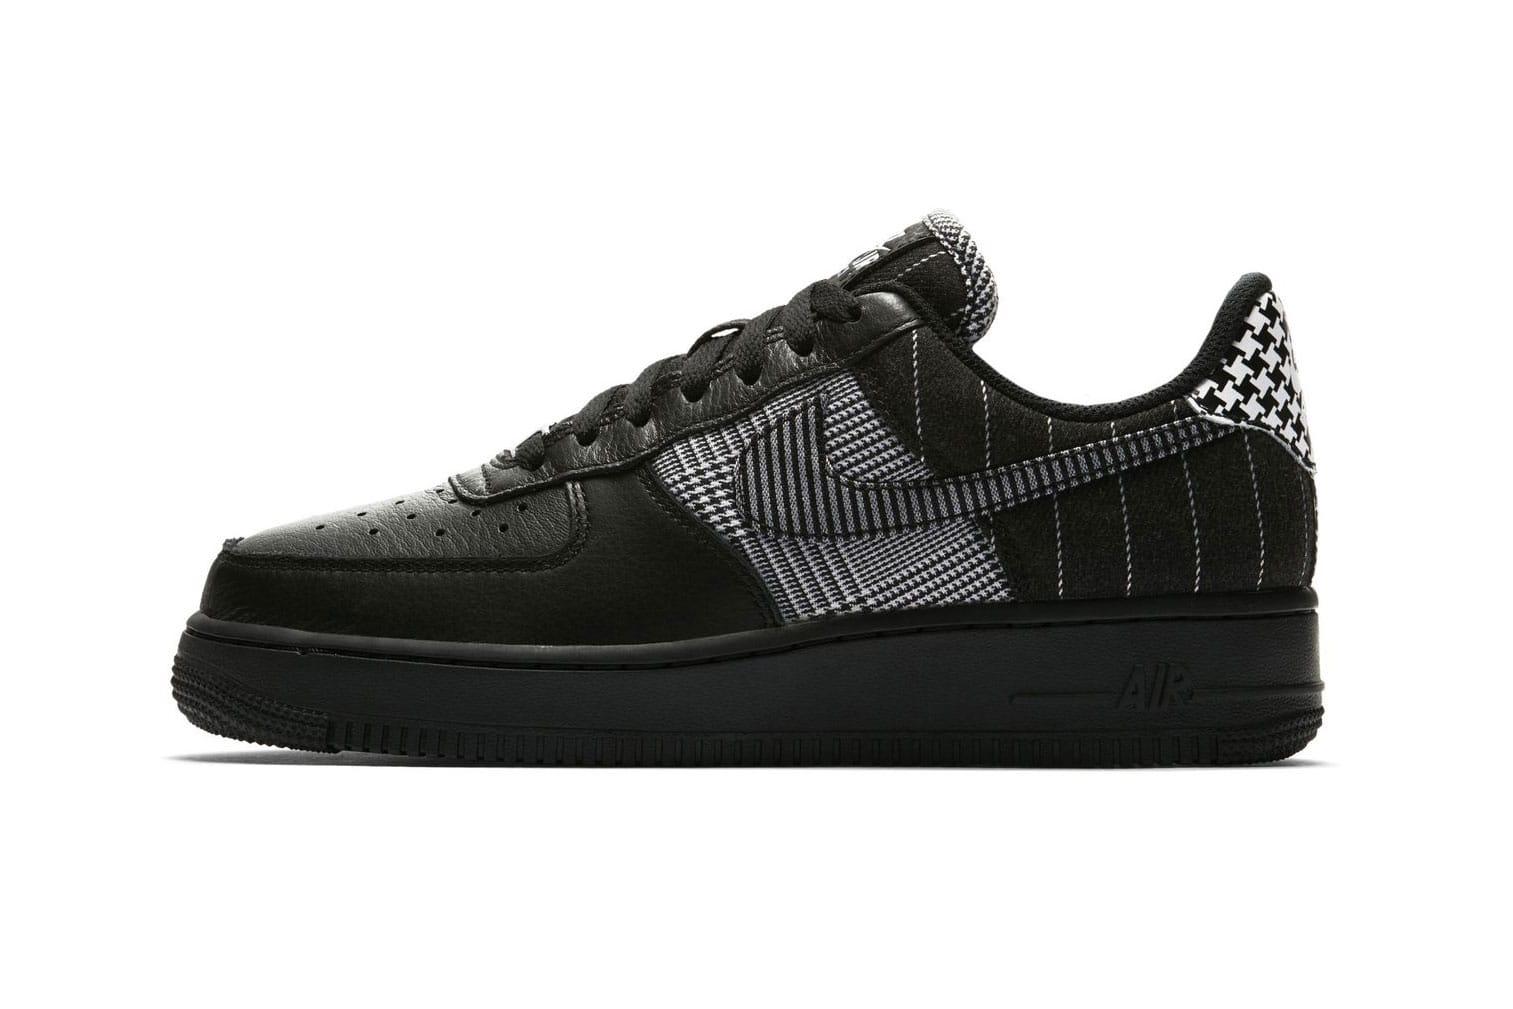 Nike Air Force 1 Low Black \